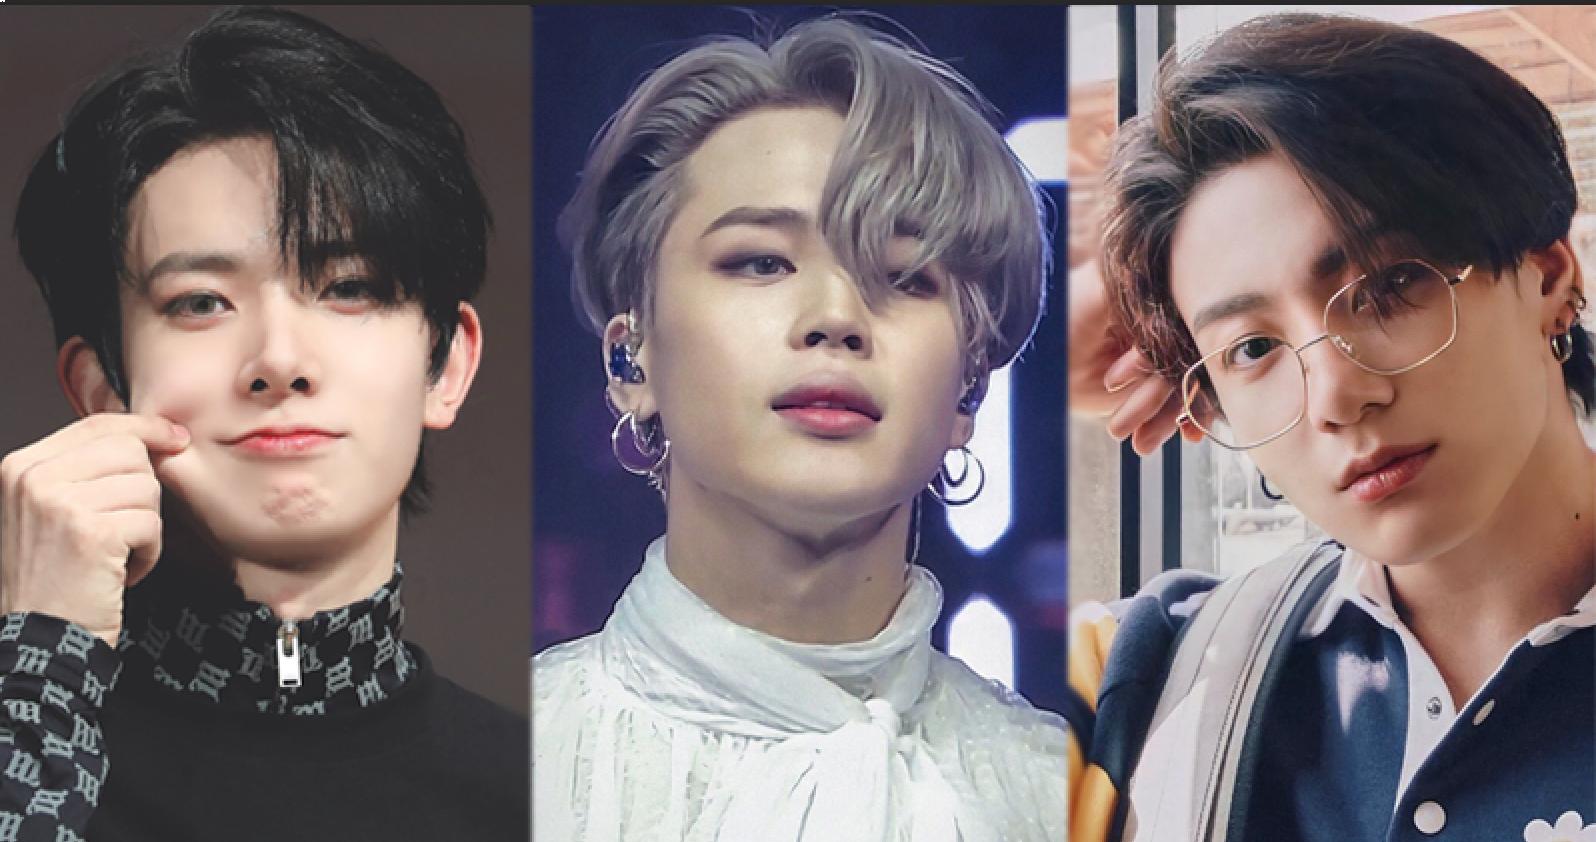 Top 20 Most Popular K-pop Idols Globally for 3rd Week of September